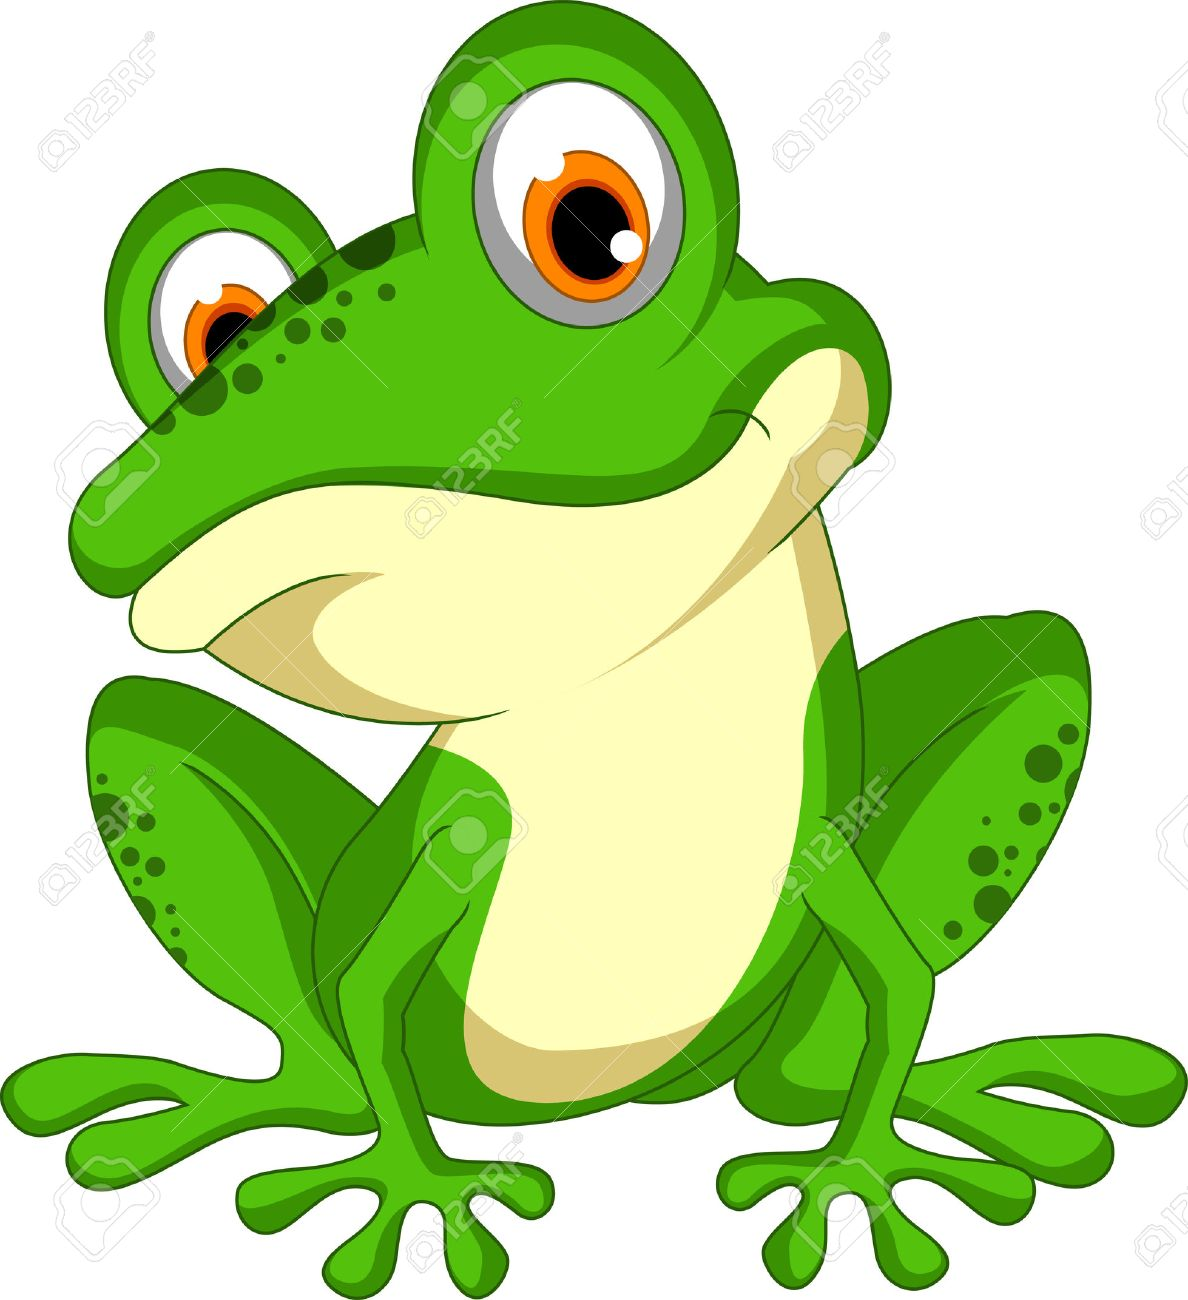 funny Green frog cartoon sitting - 37760721